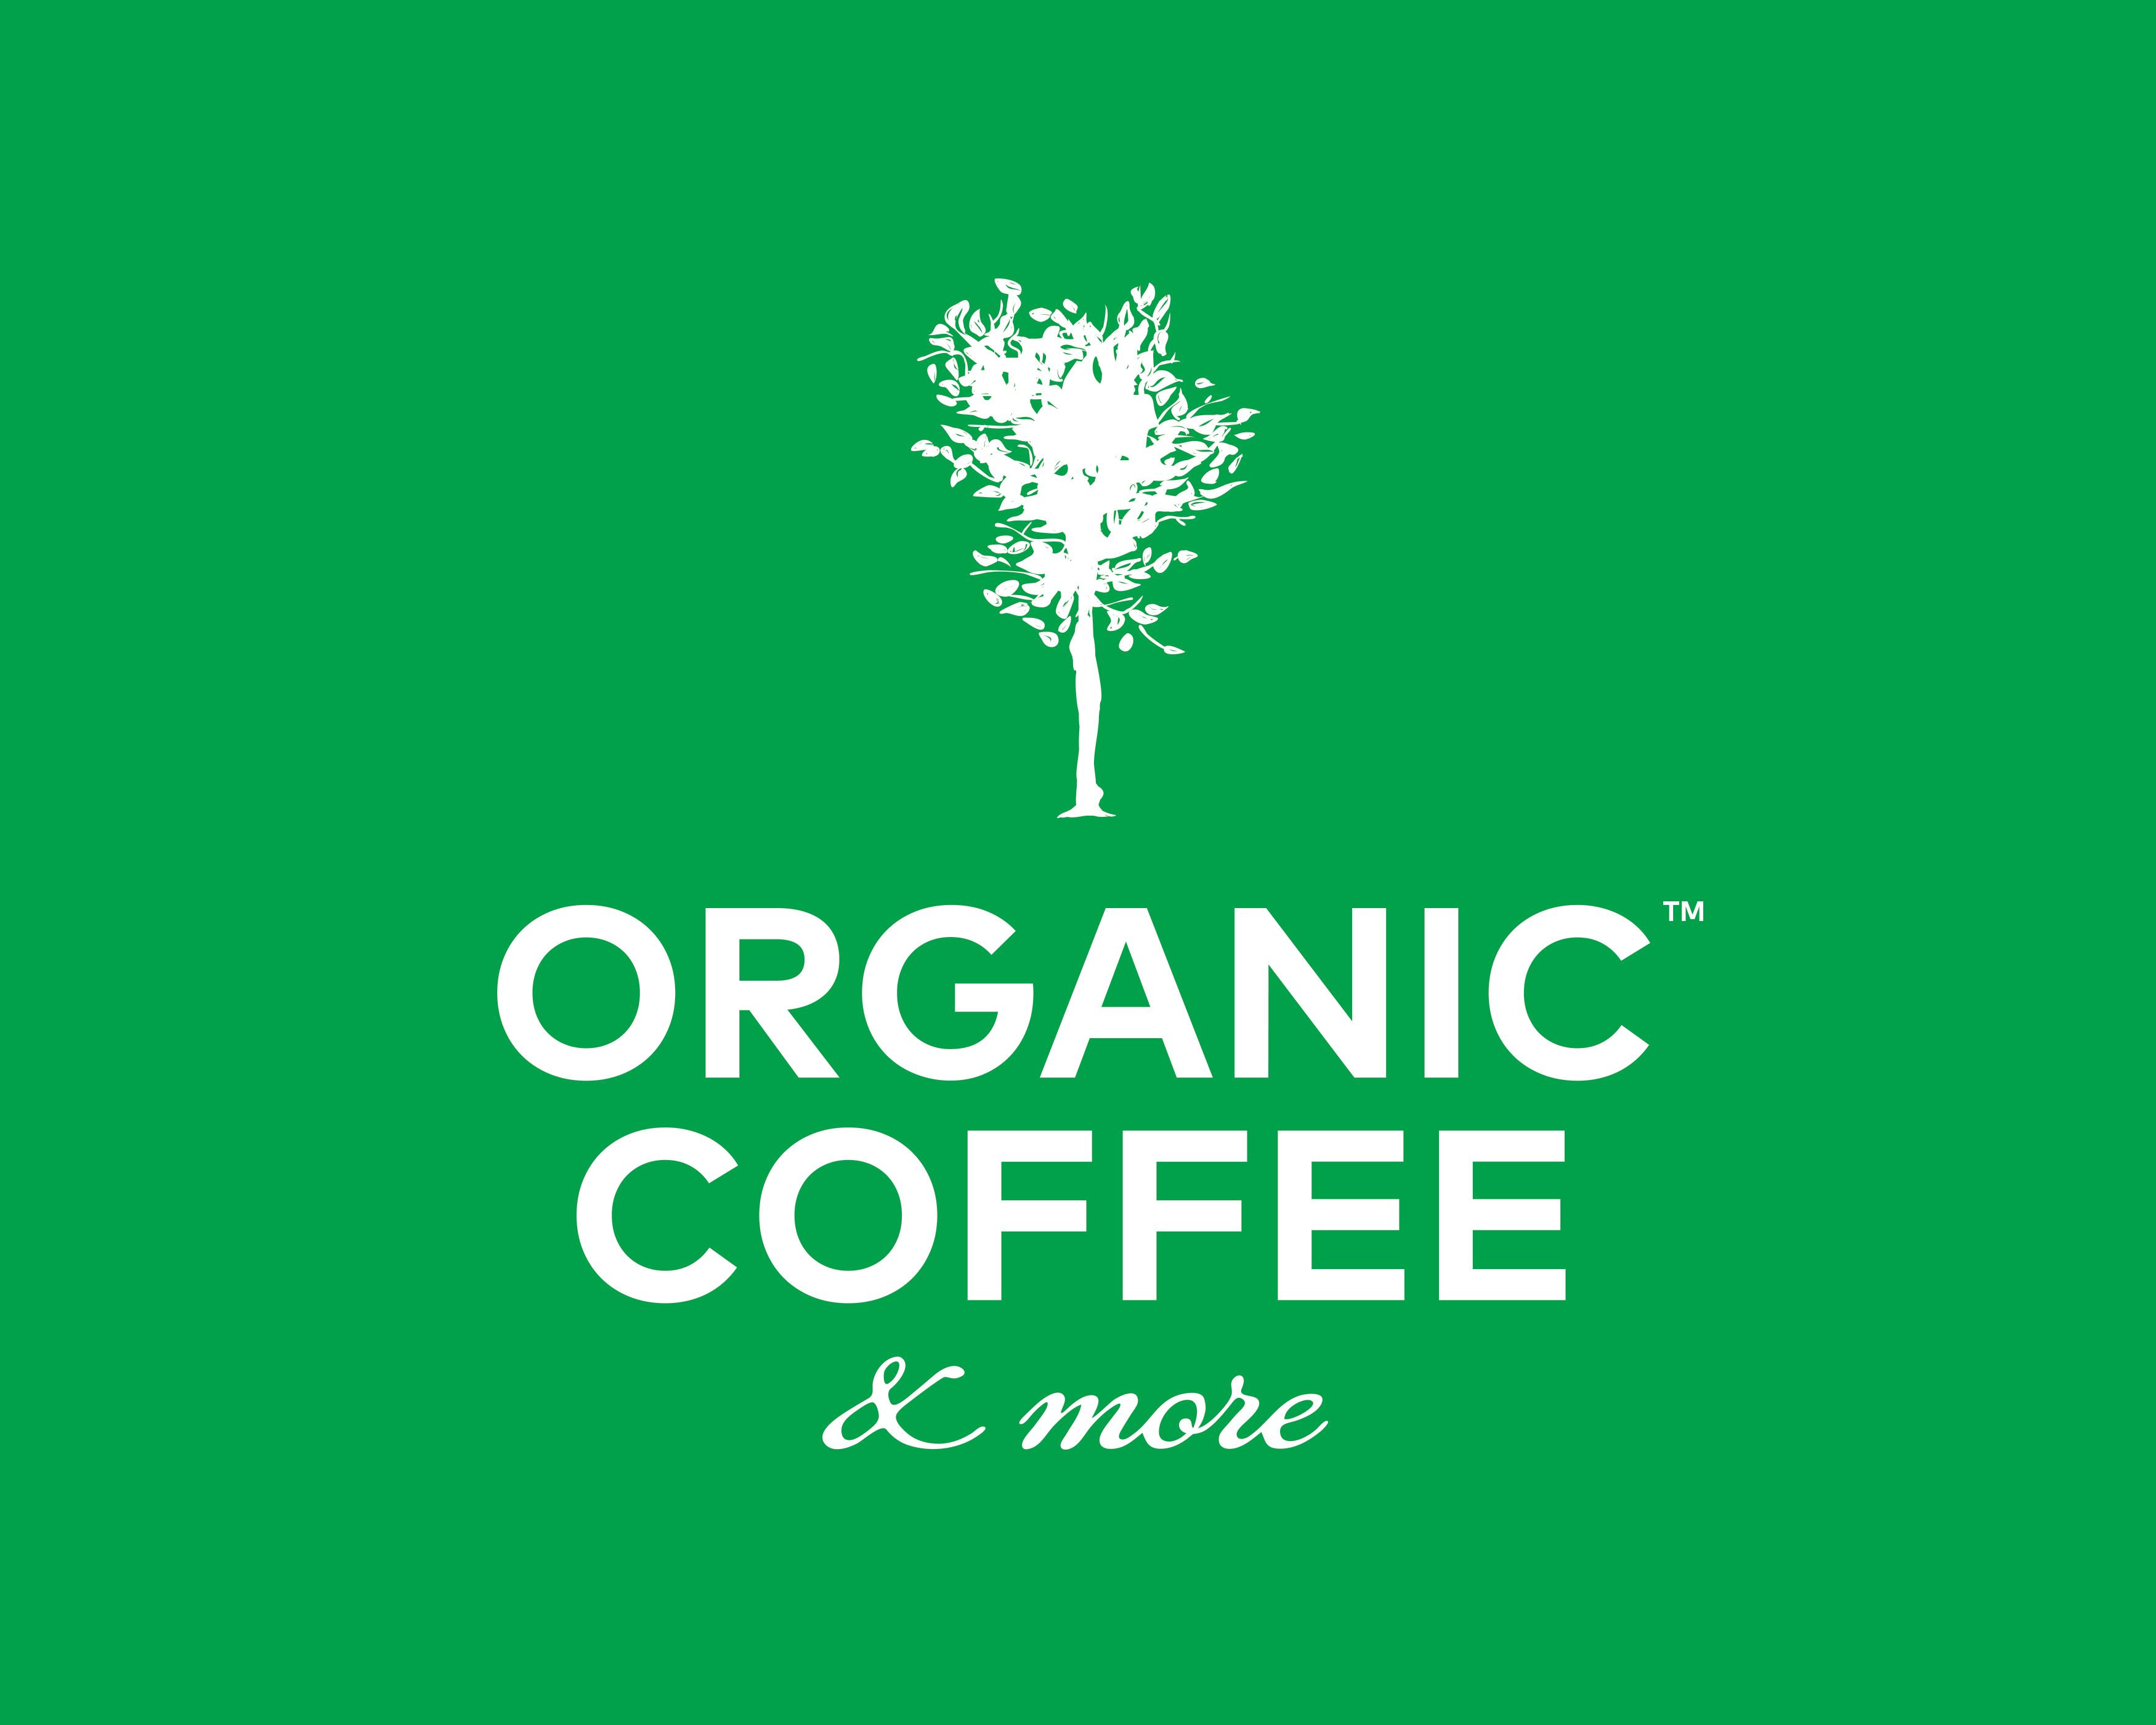 www.facebook.com/organiccoffee.kawiarnie